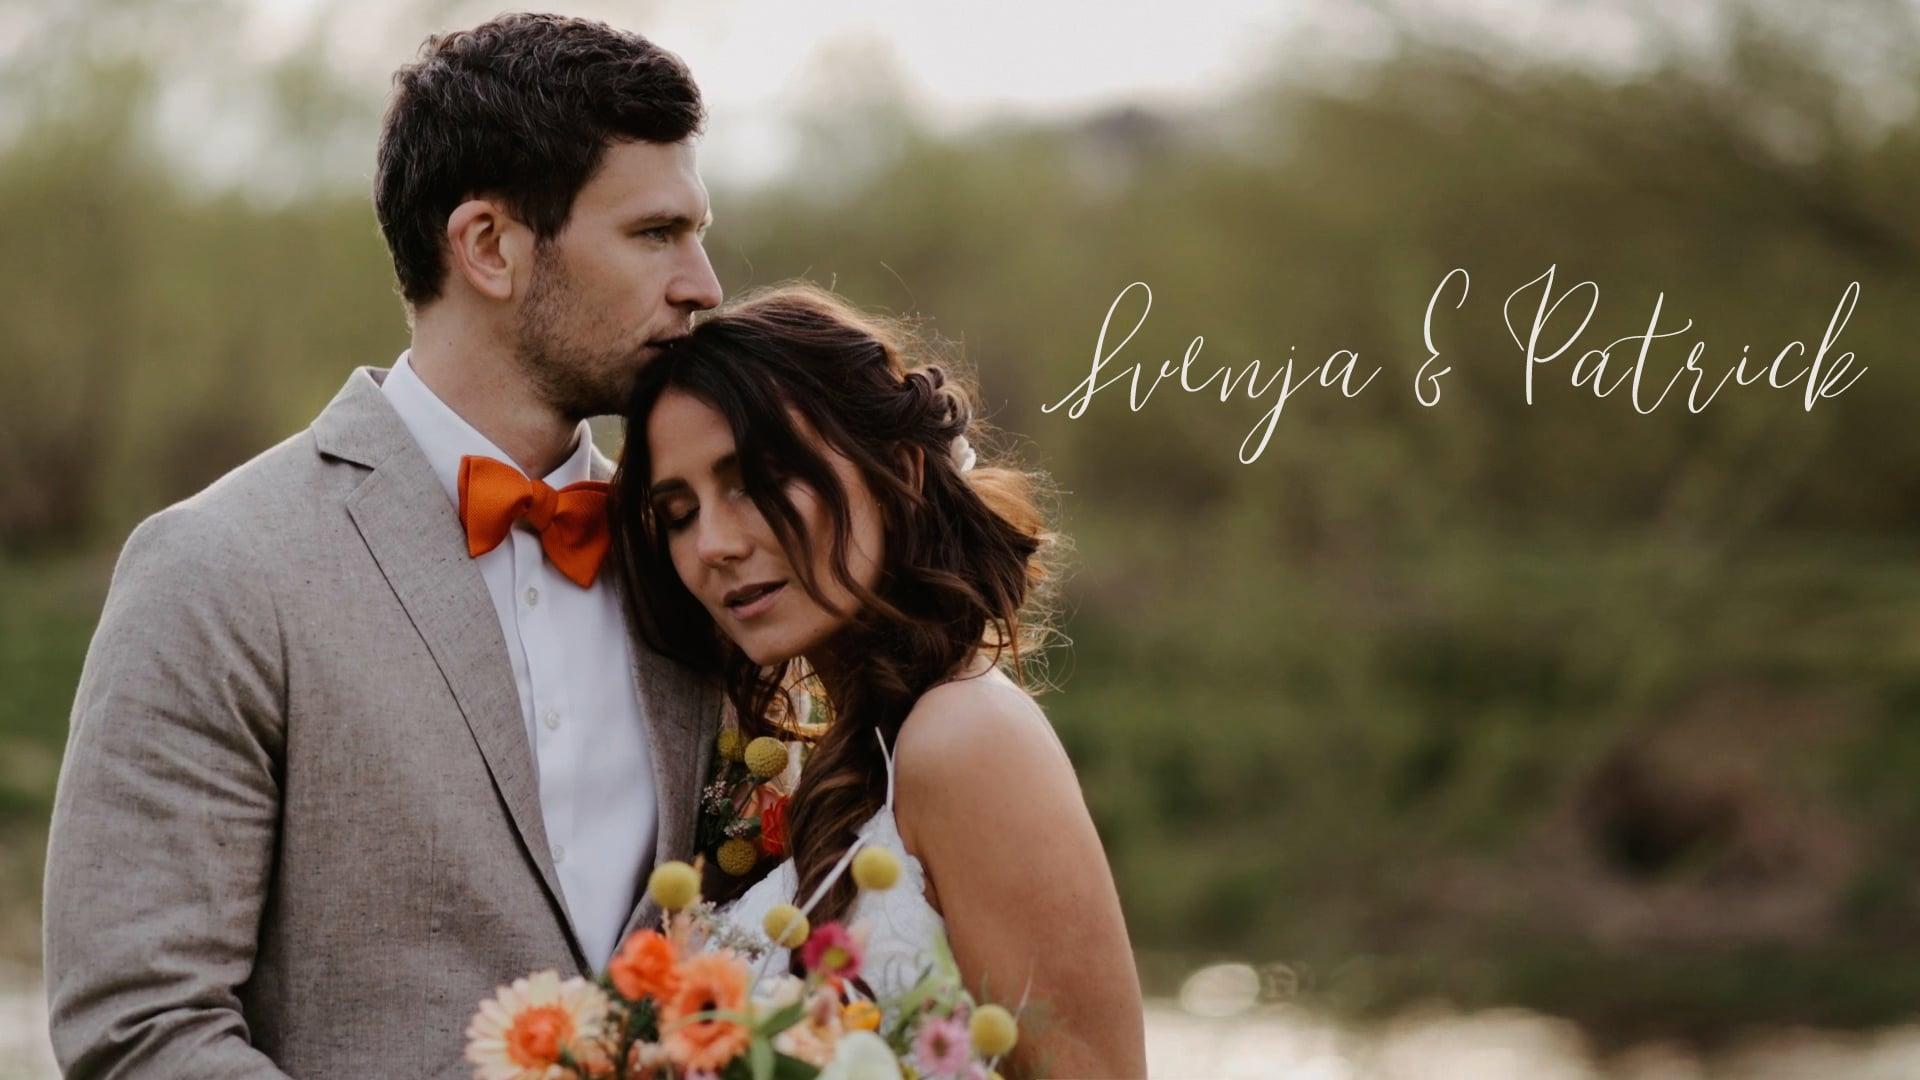 Juliane Kaeppel - authentic natural wedding photography & film